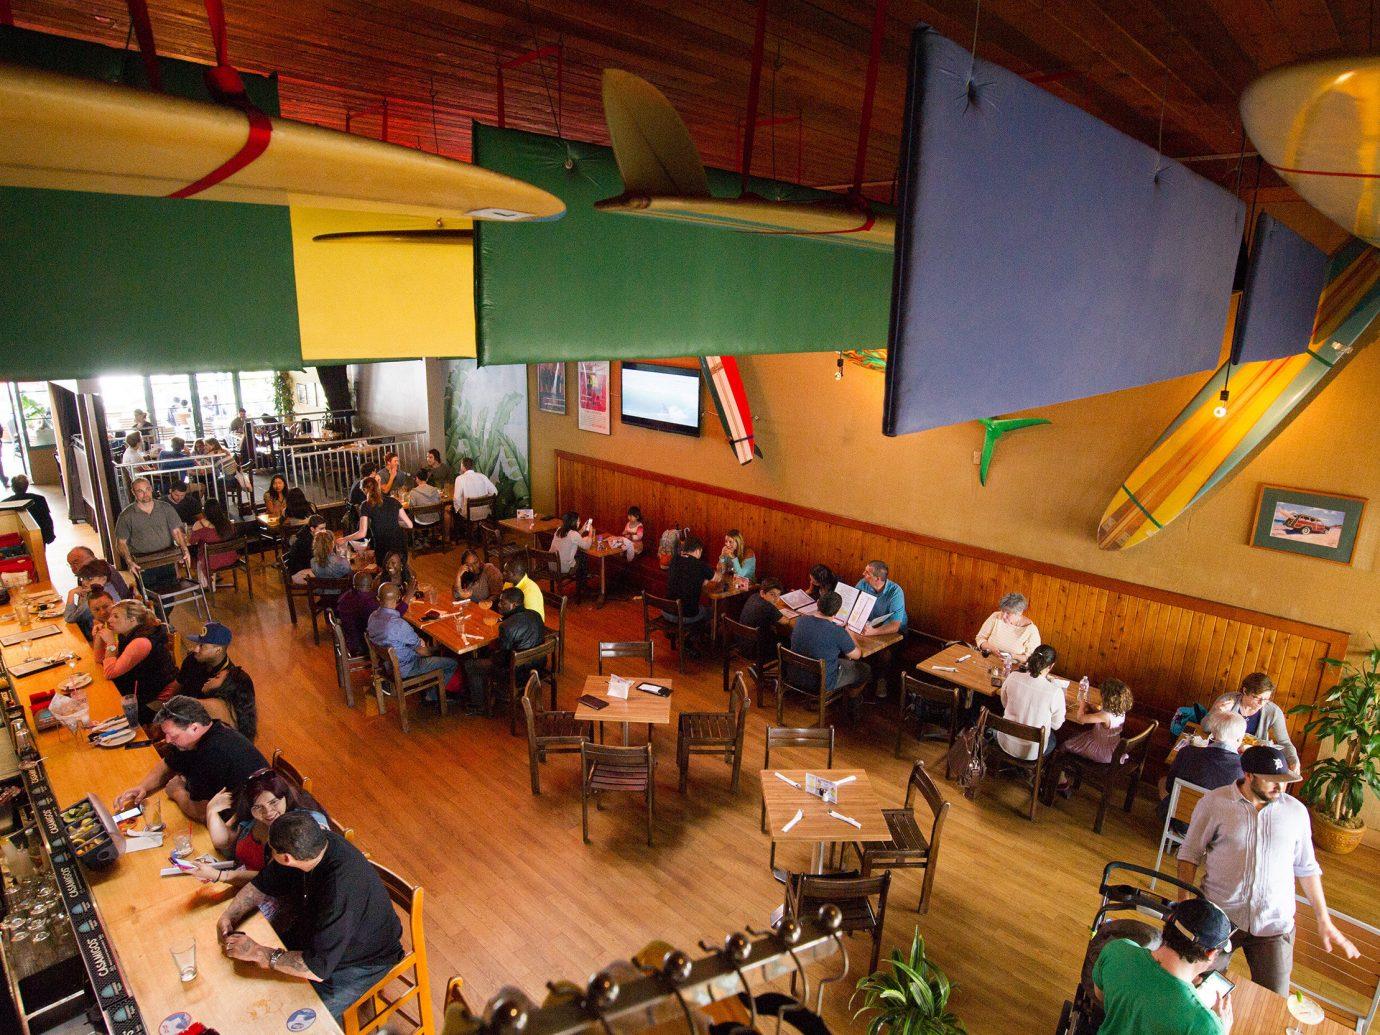 Food + Drink indoor meal restaurant auditorium cluttered area